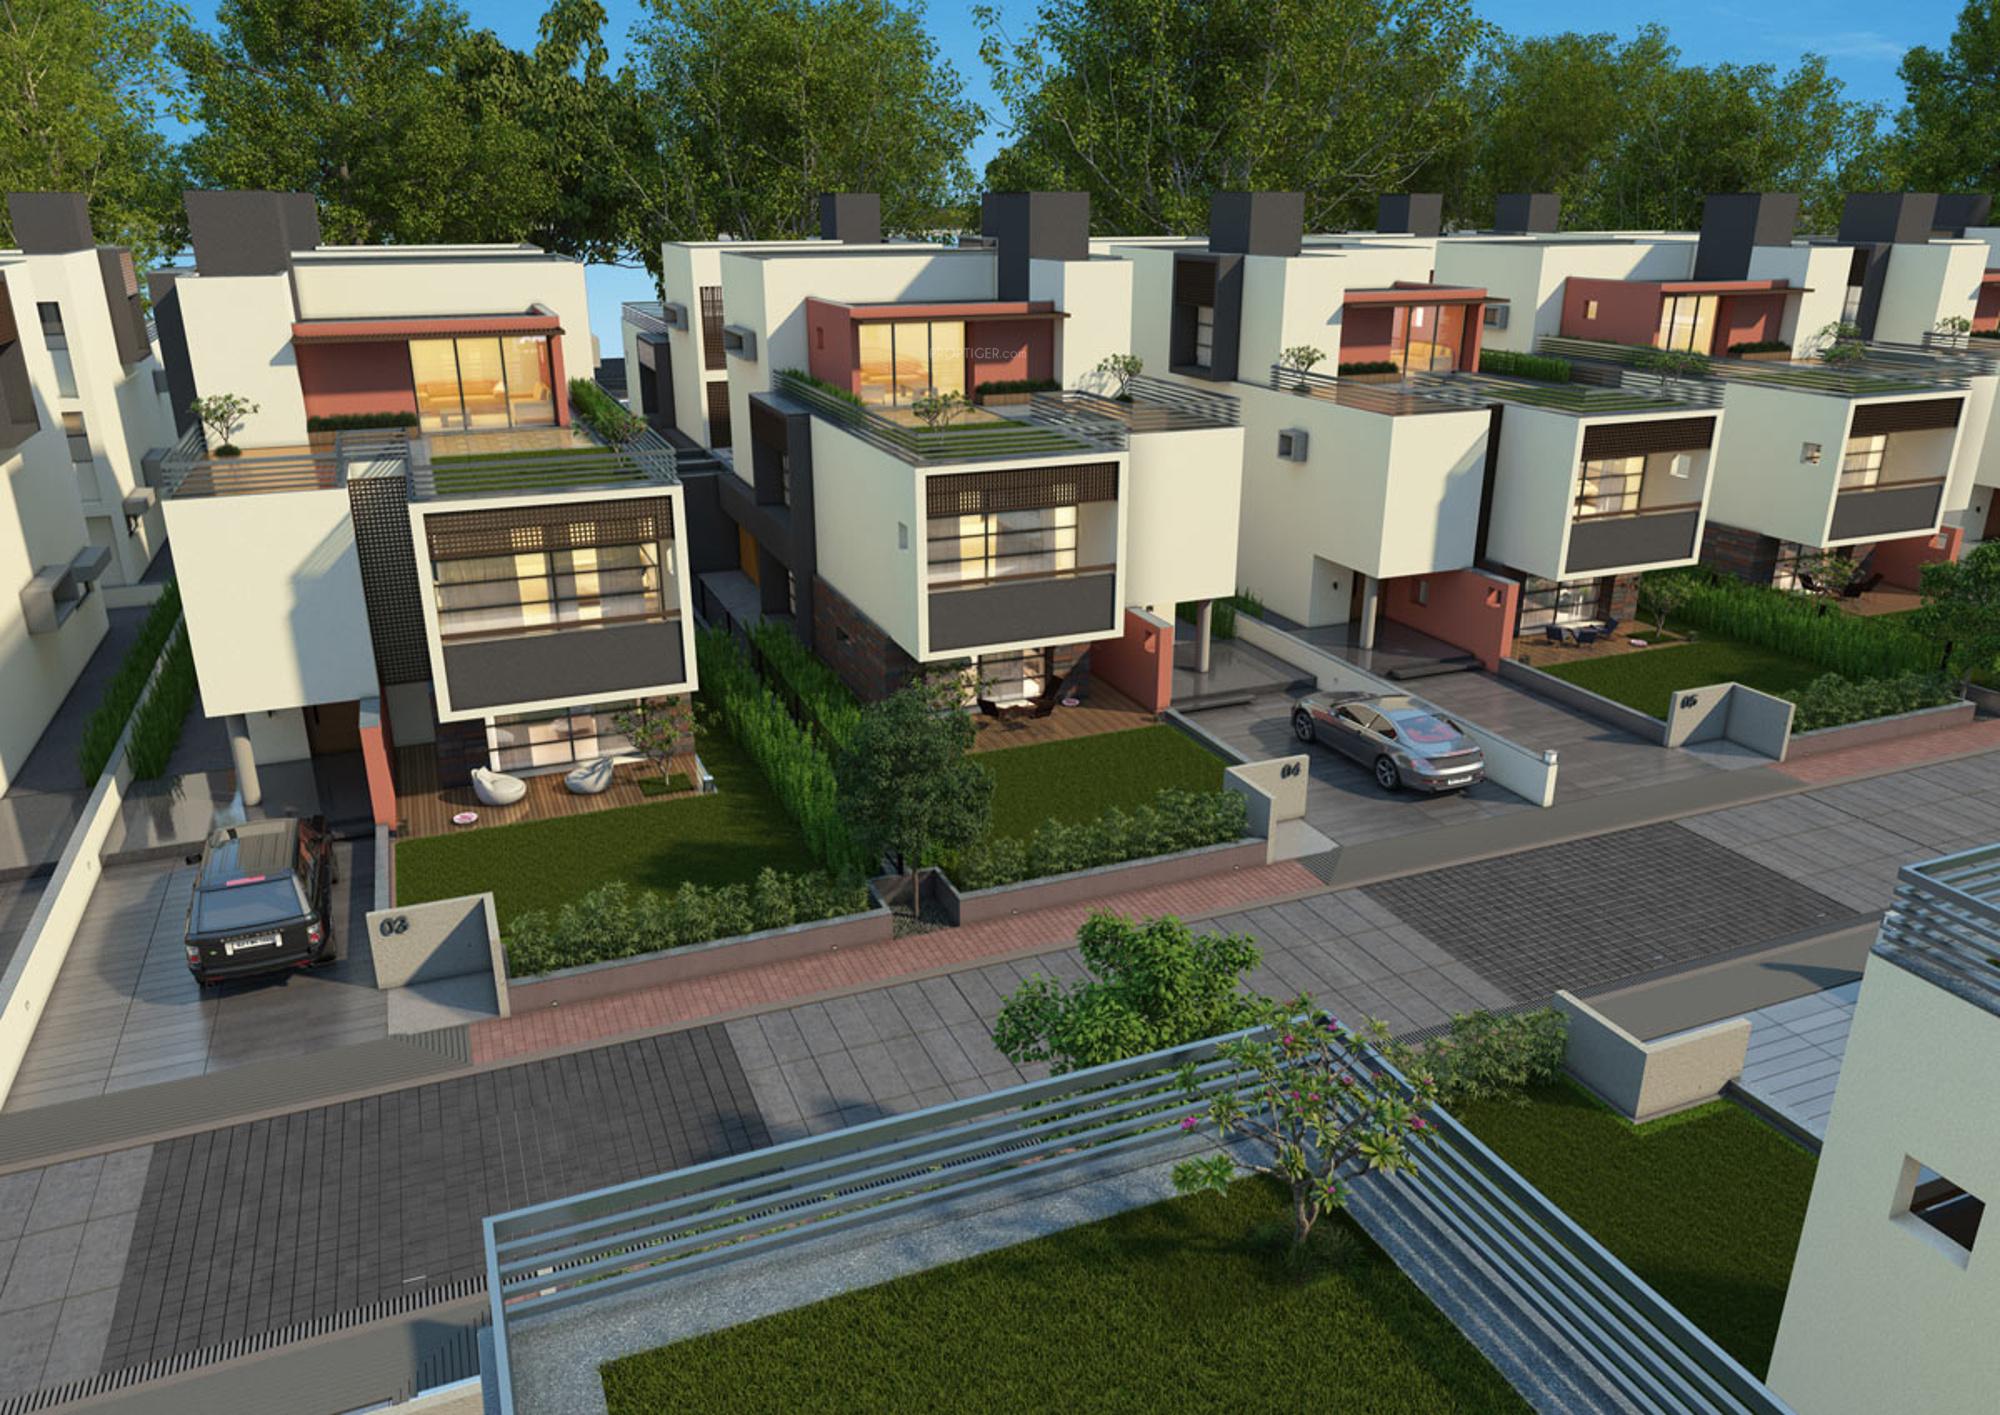 6030 sq ft 4 bhk floor plan image goyal and co hariyana group vernis available for sale. Black Bedroom Furniture Sets. Home Design Ideas